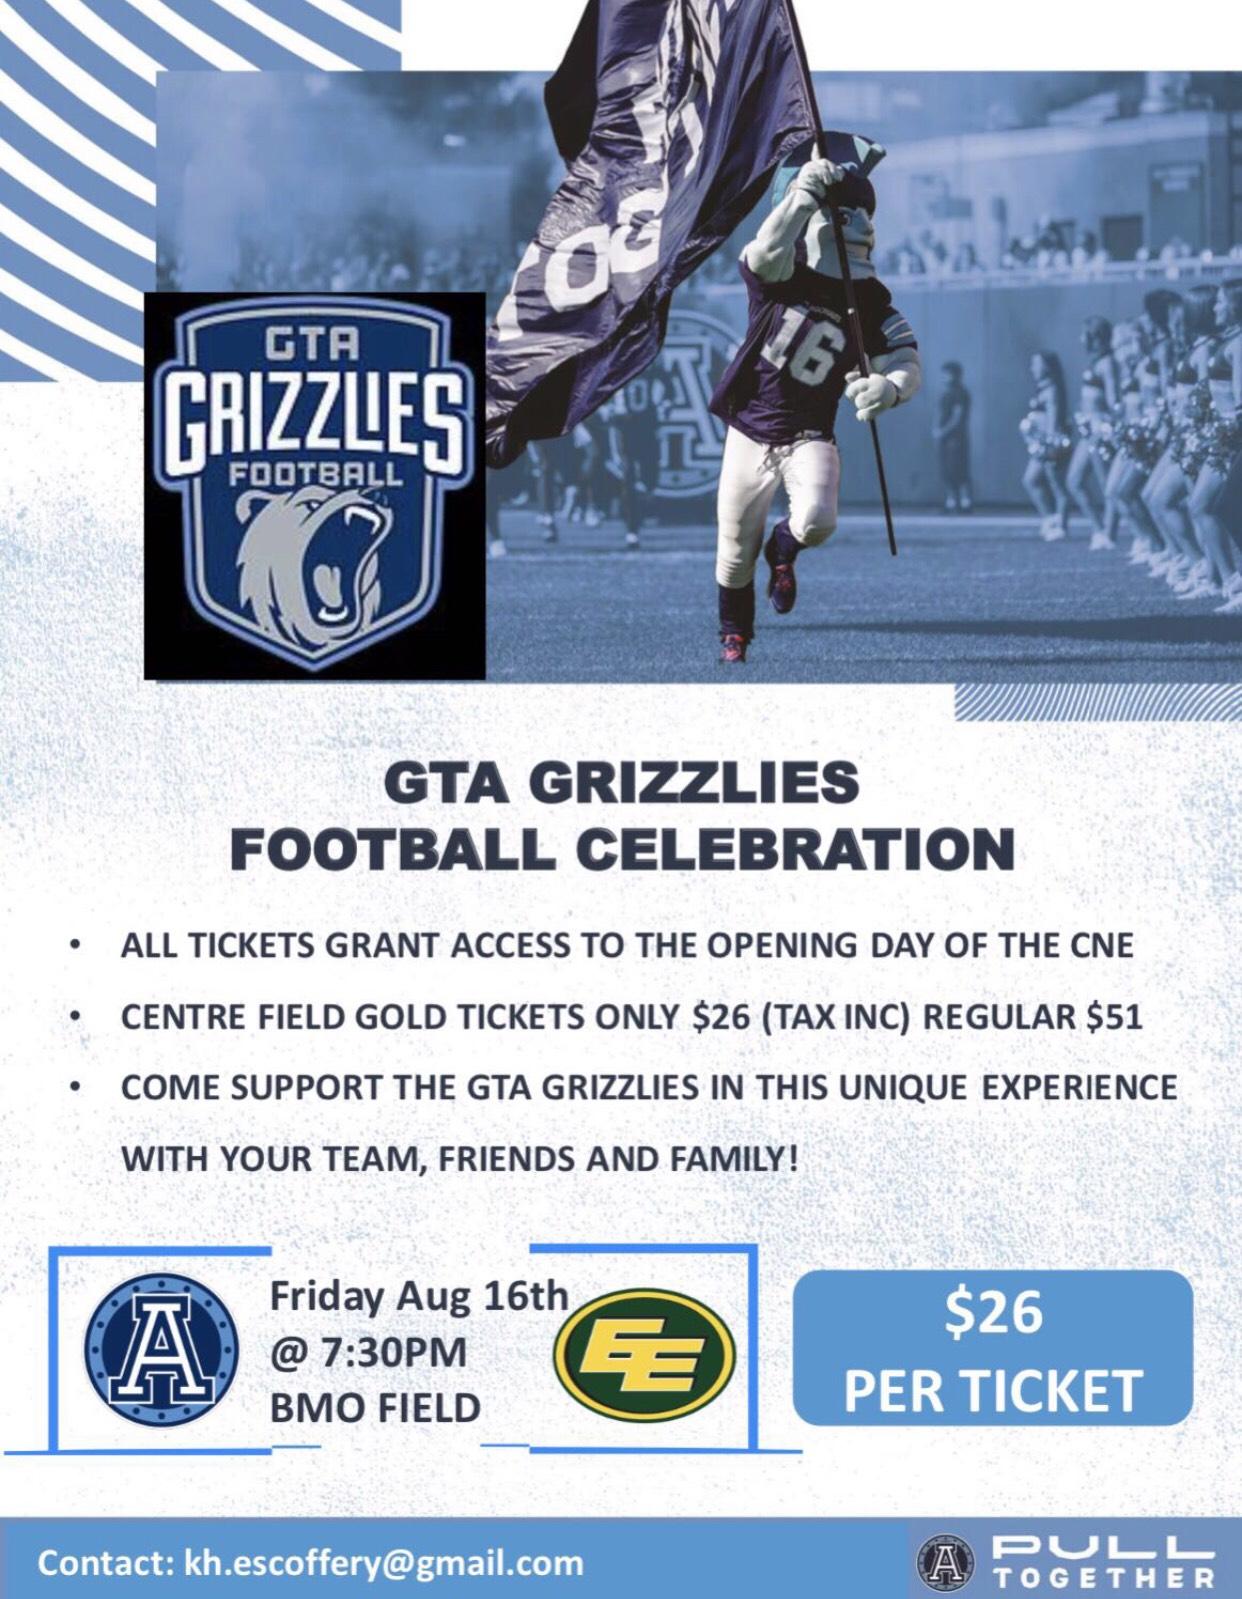 GTA Grizzlies Football Celebration!